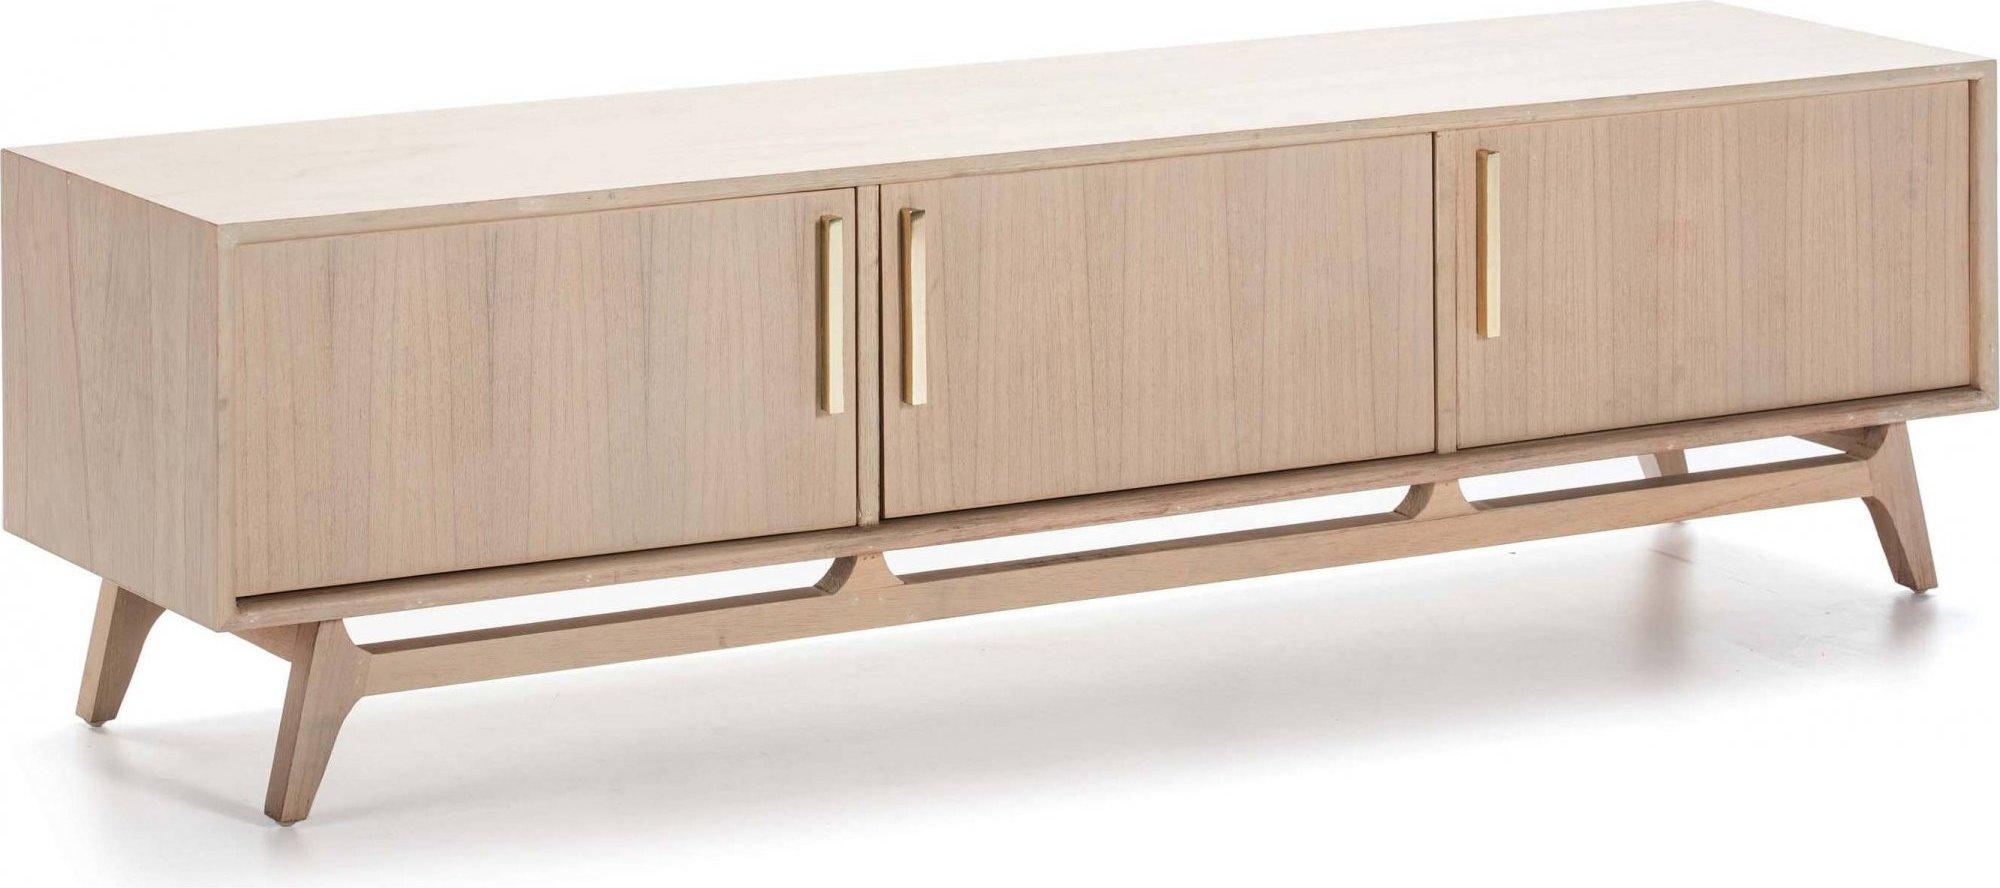 Meuble tv en bois clair 160x40x45